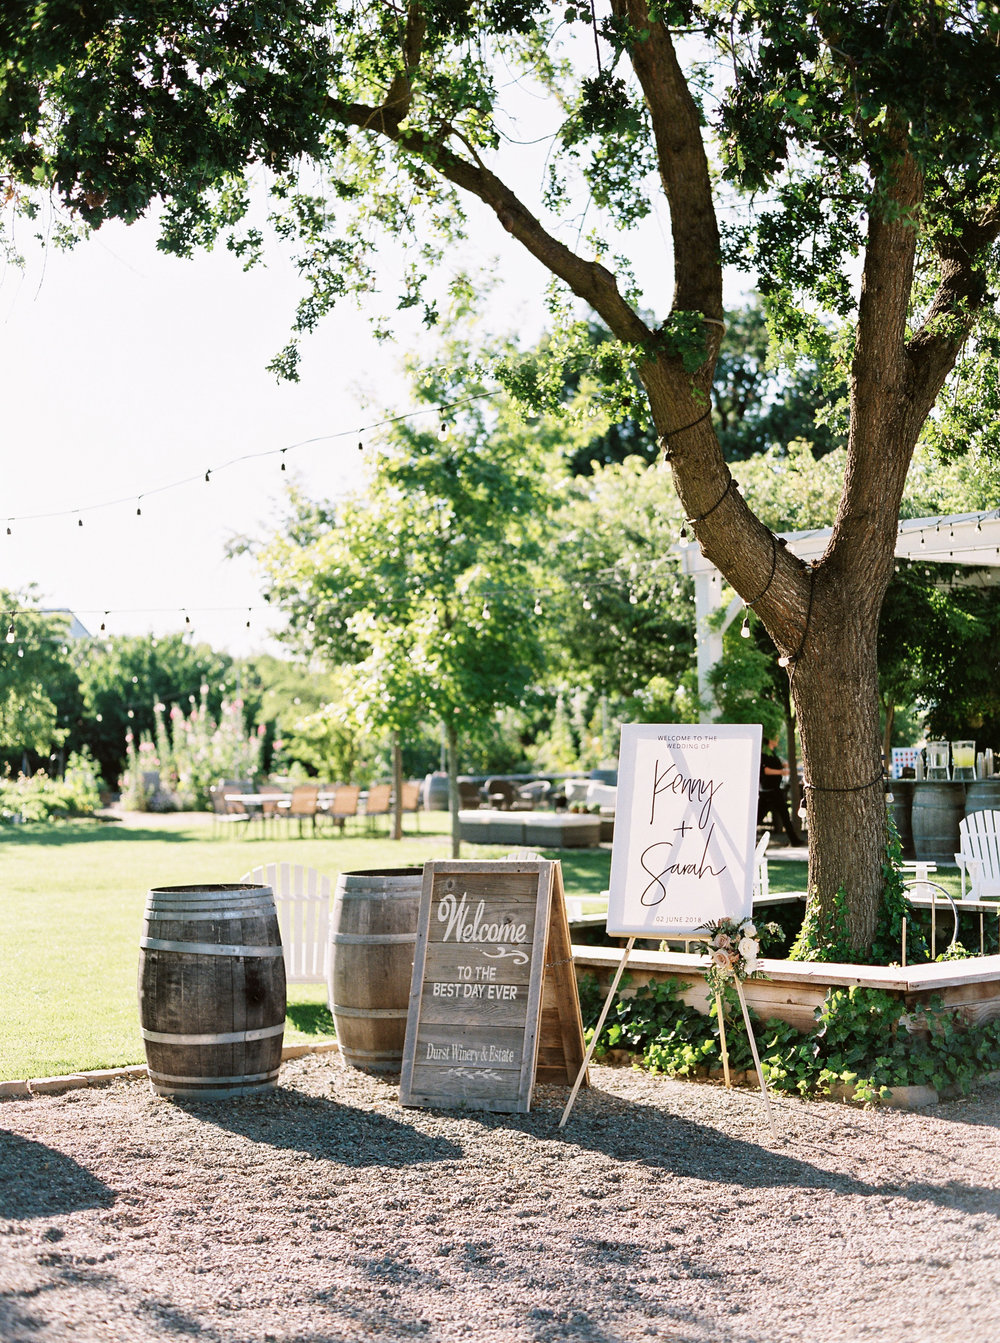 Durst-winery-wedding-in-lodi-calfornia-146.jpg